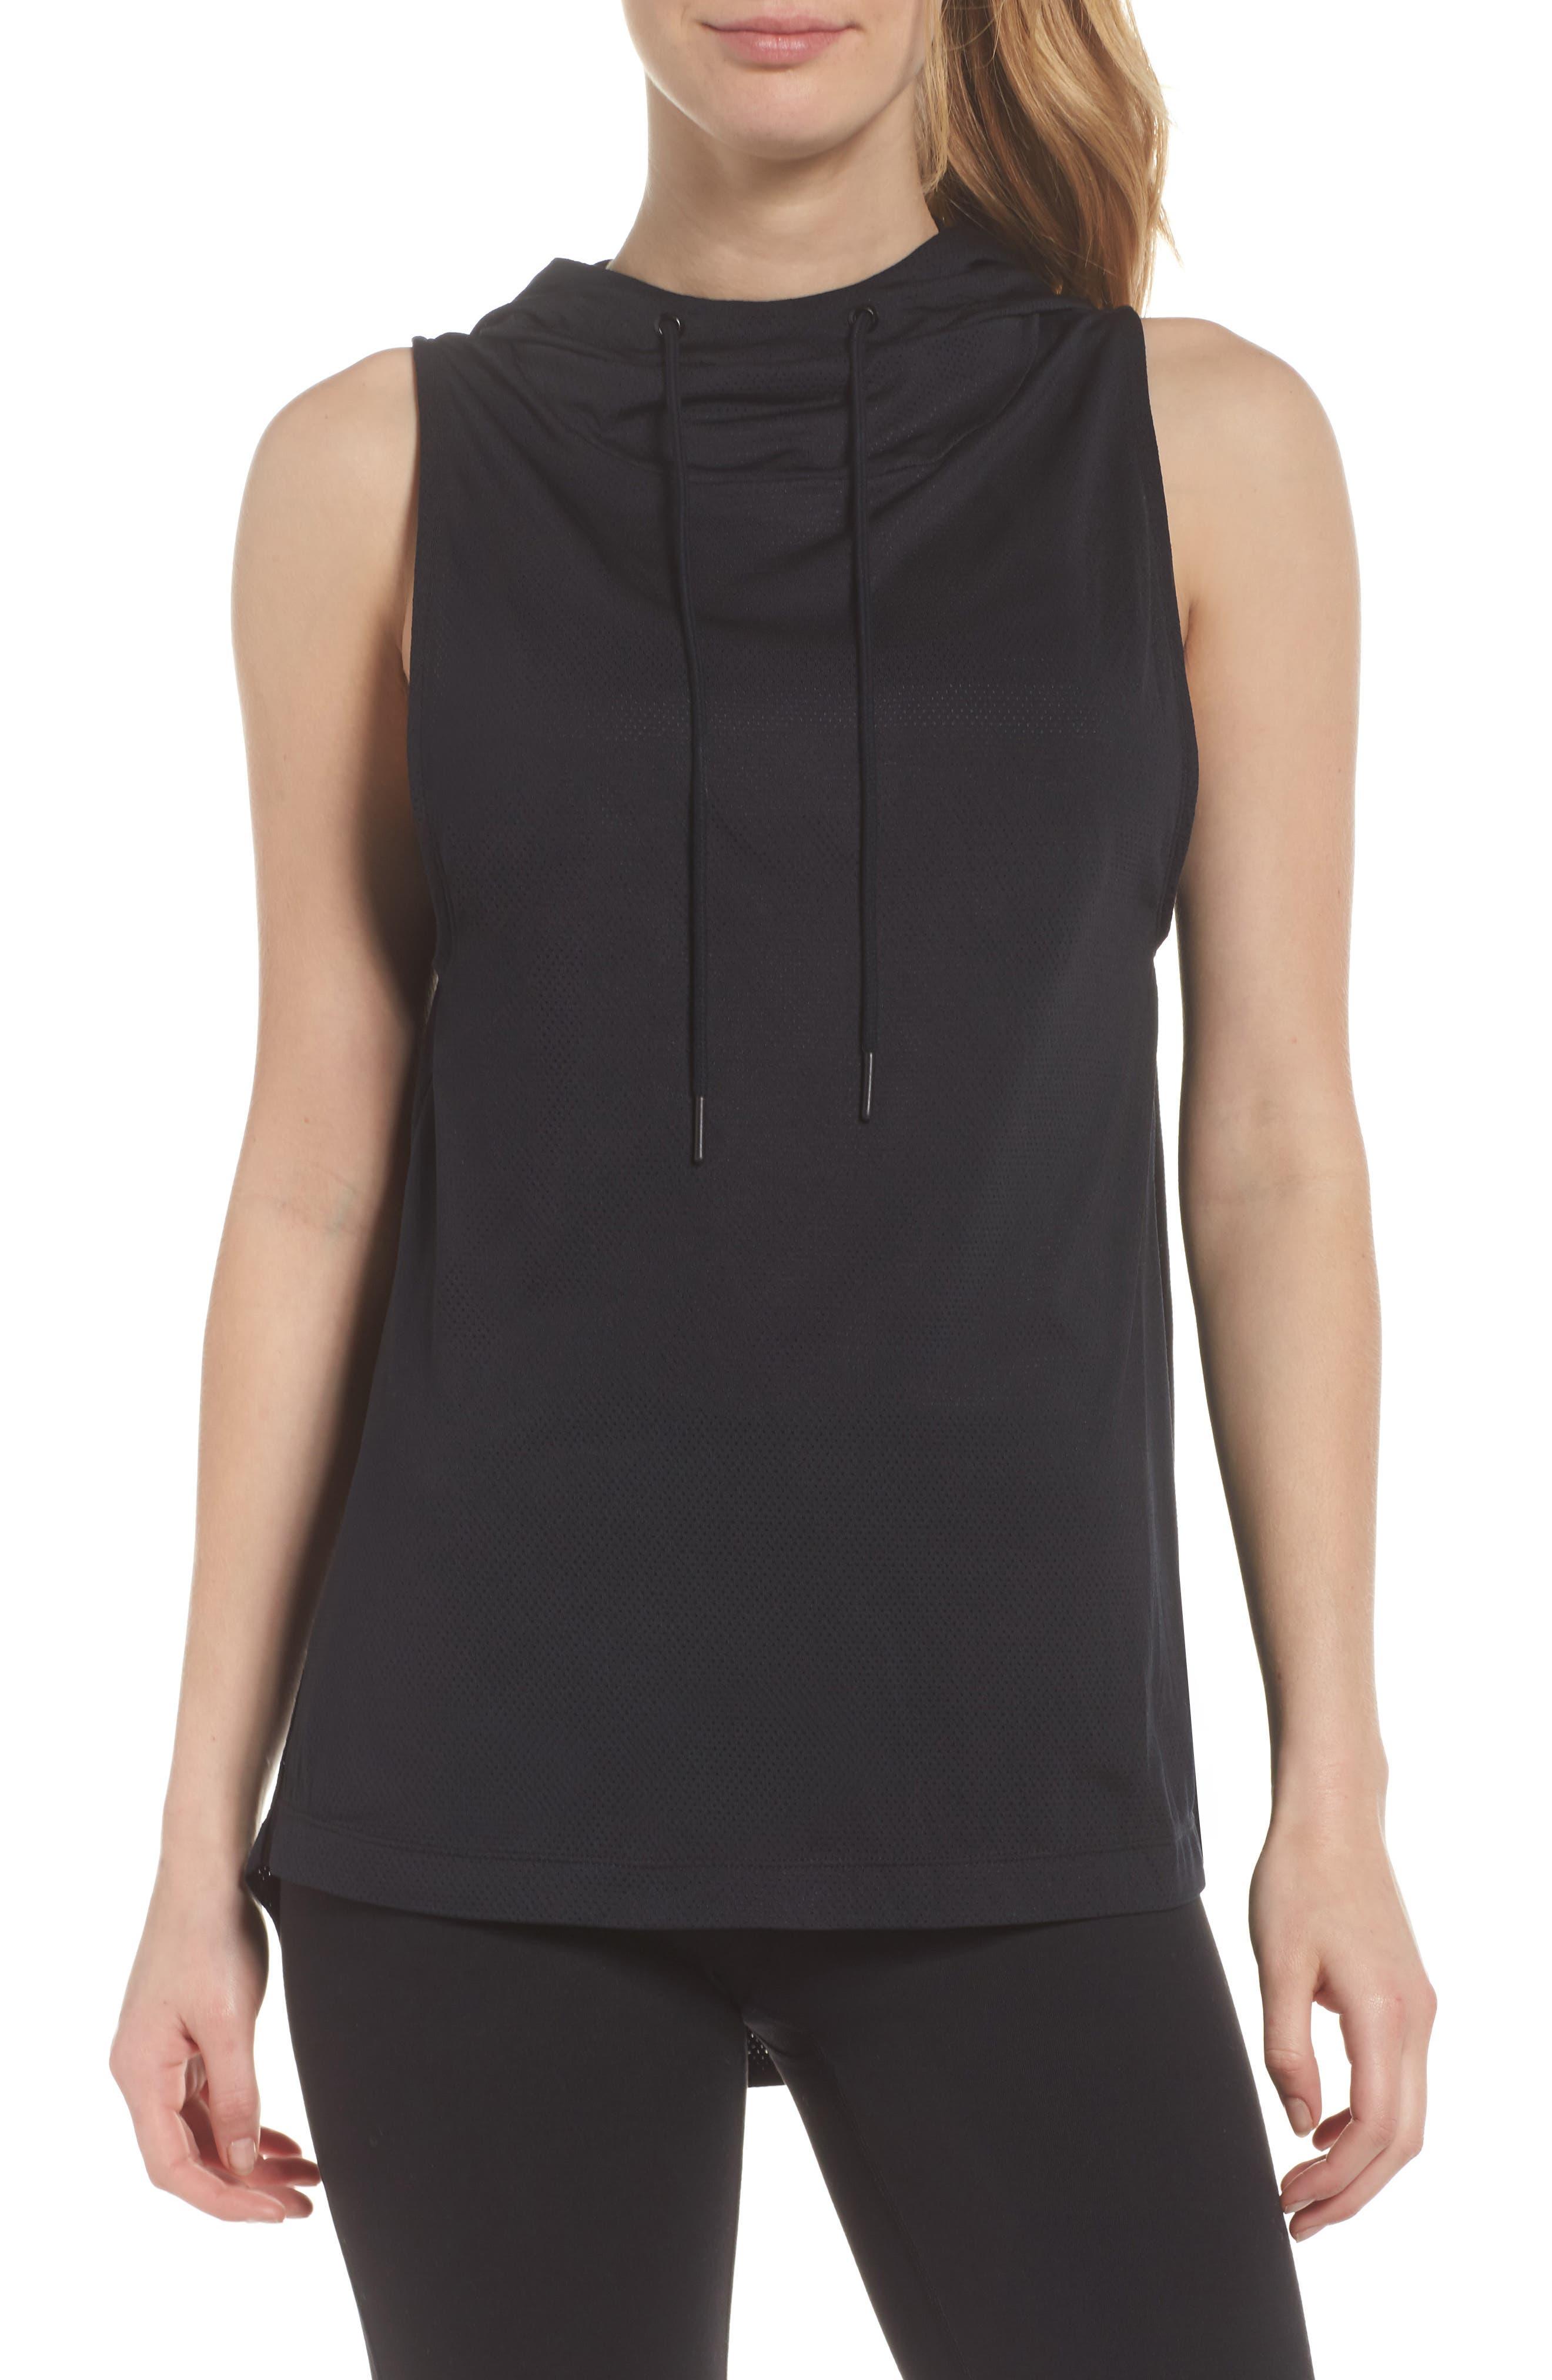 Endurance Hoodie Vest,                         Main,                         color, Black